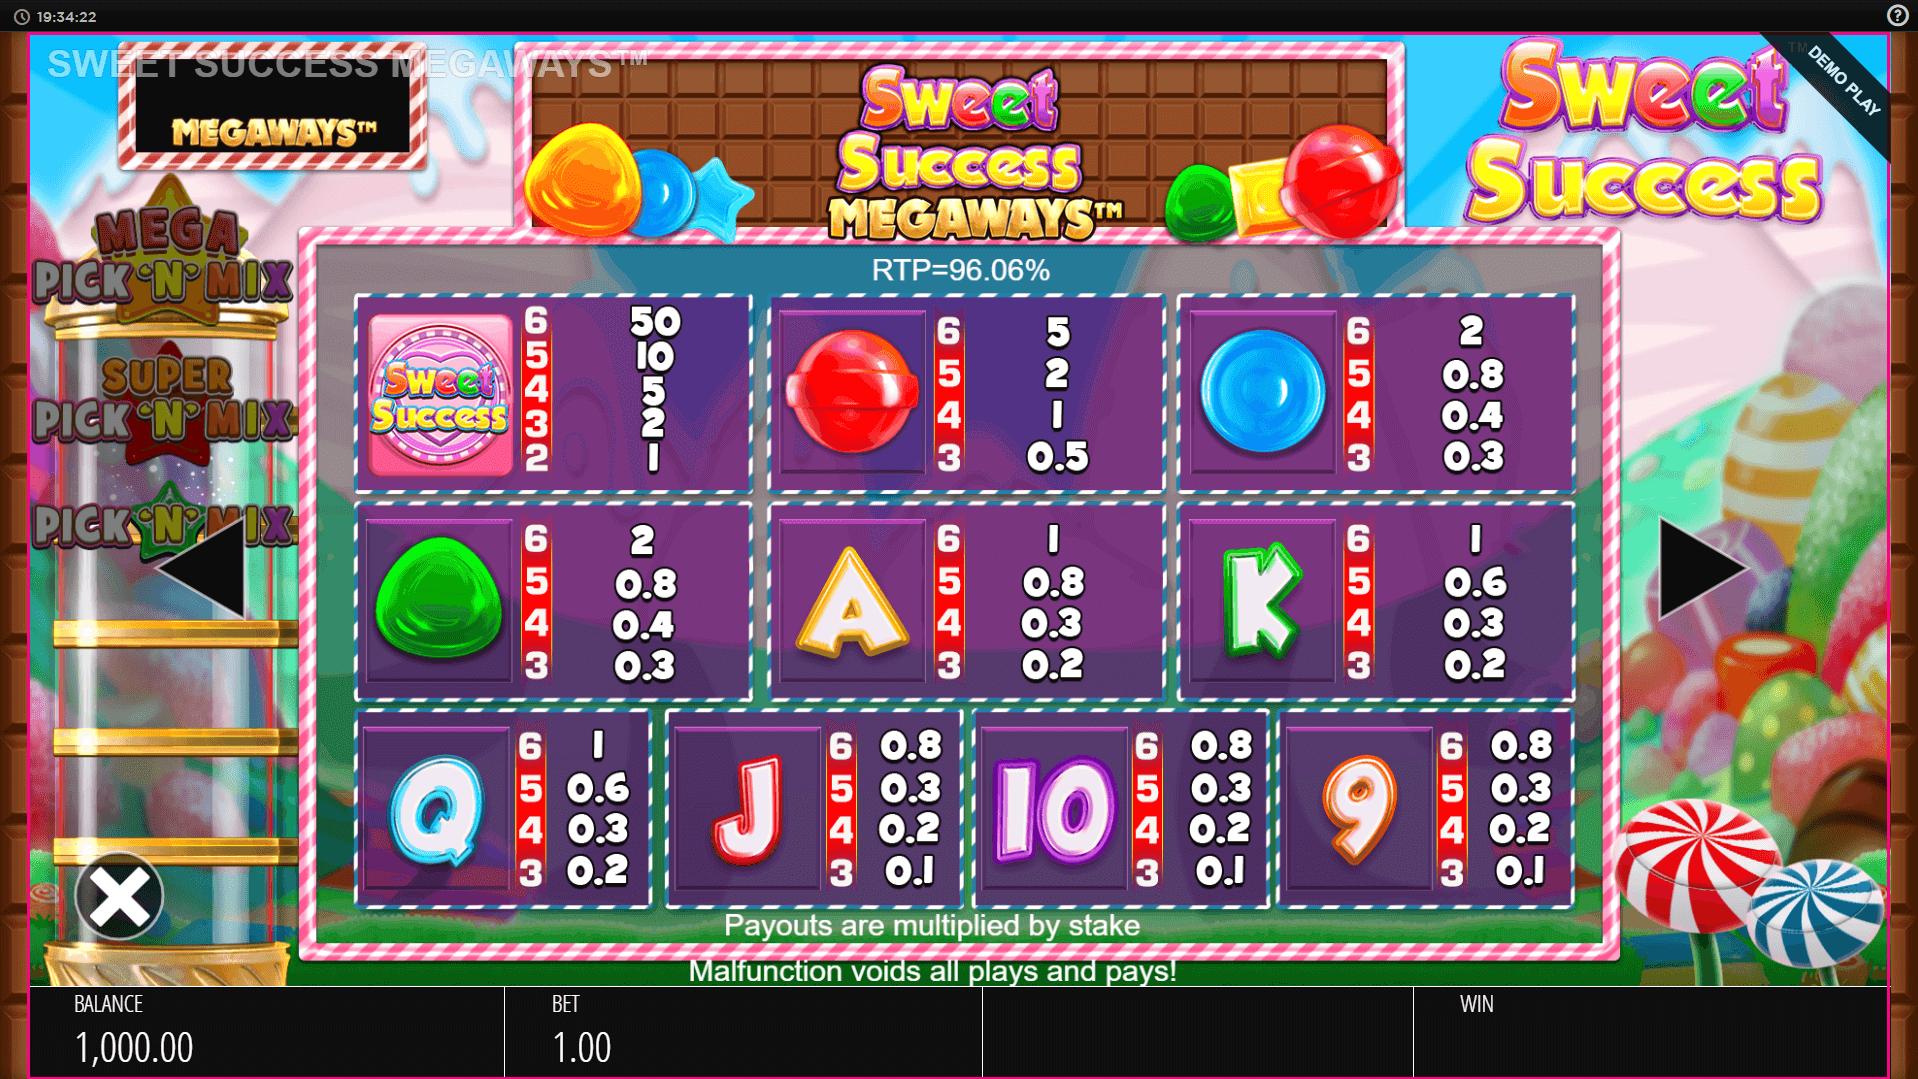 Sweet Success Megaways Slot Machine